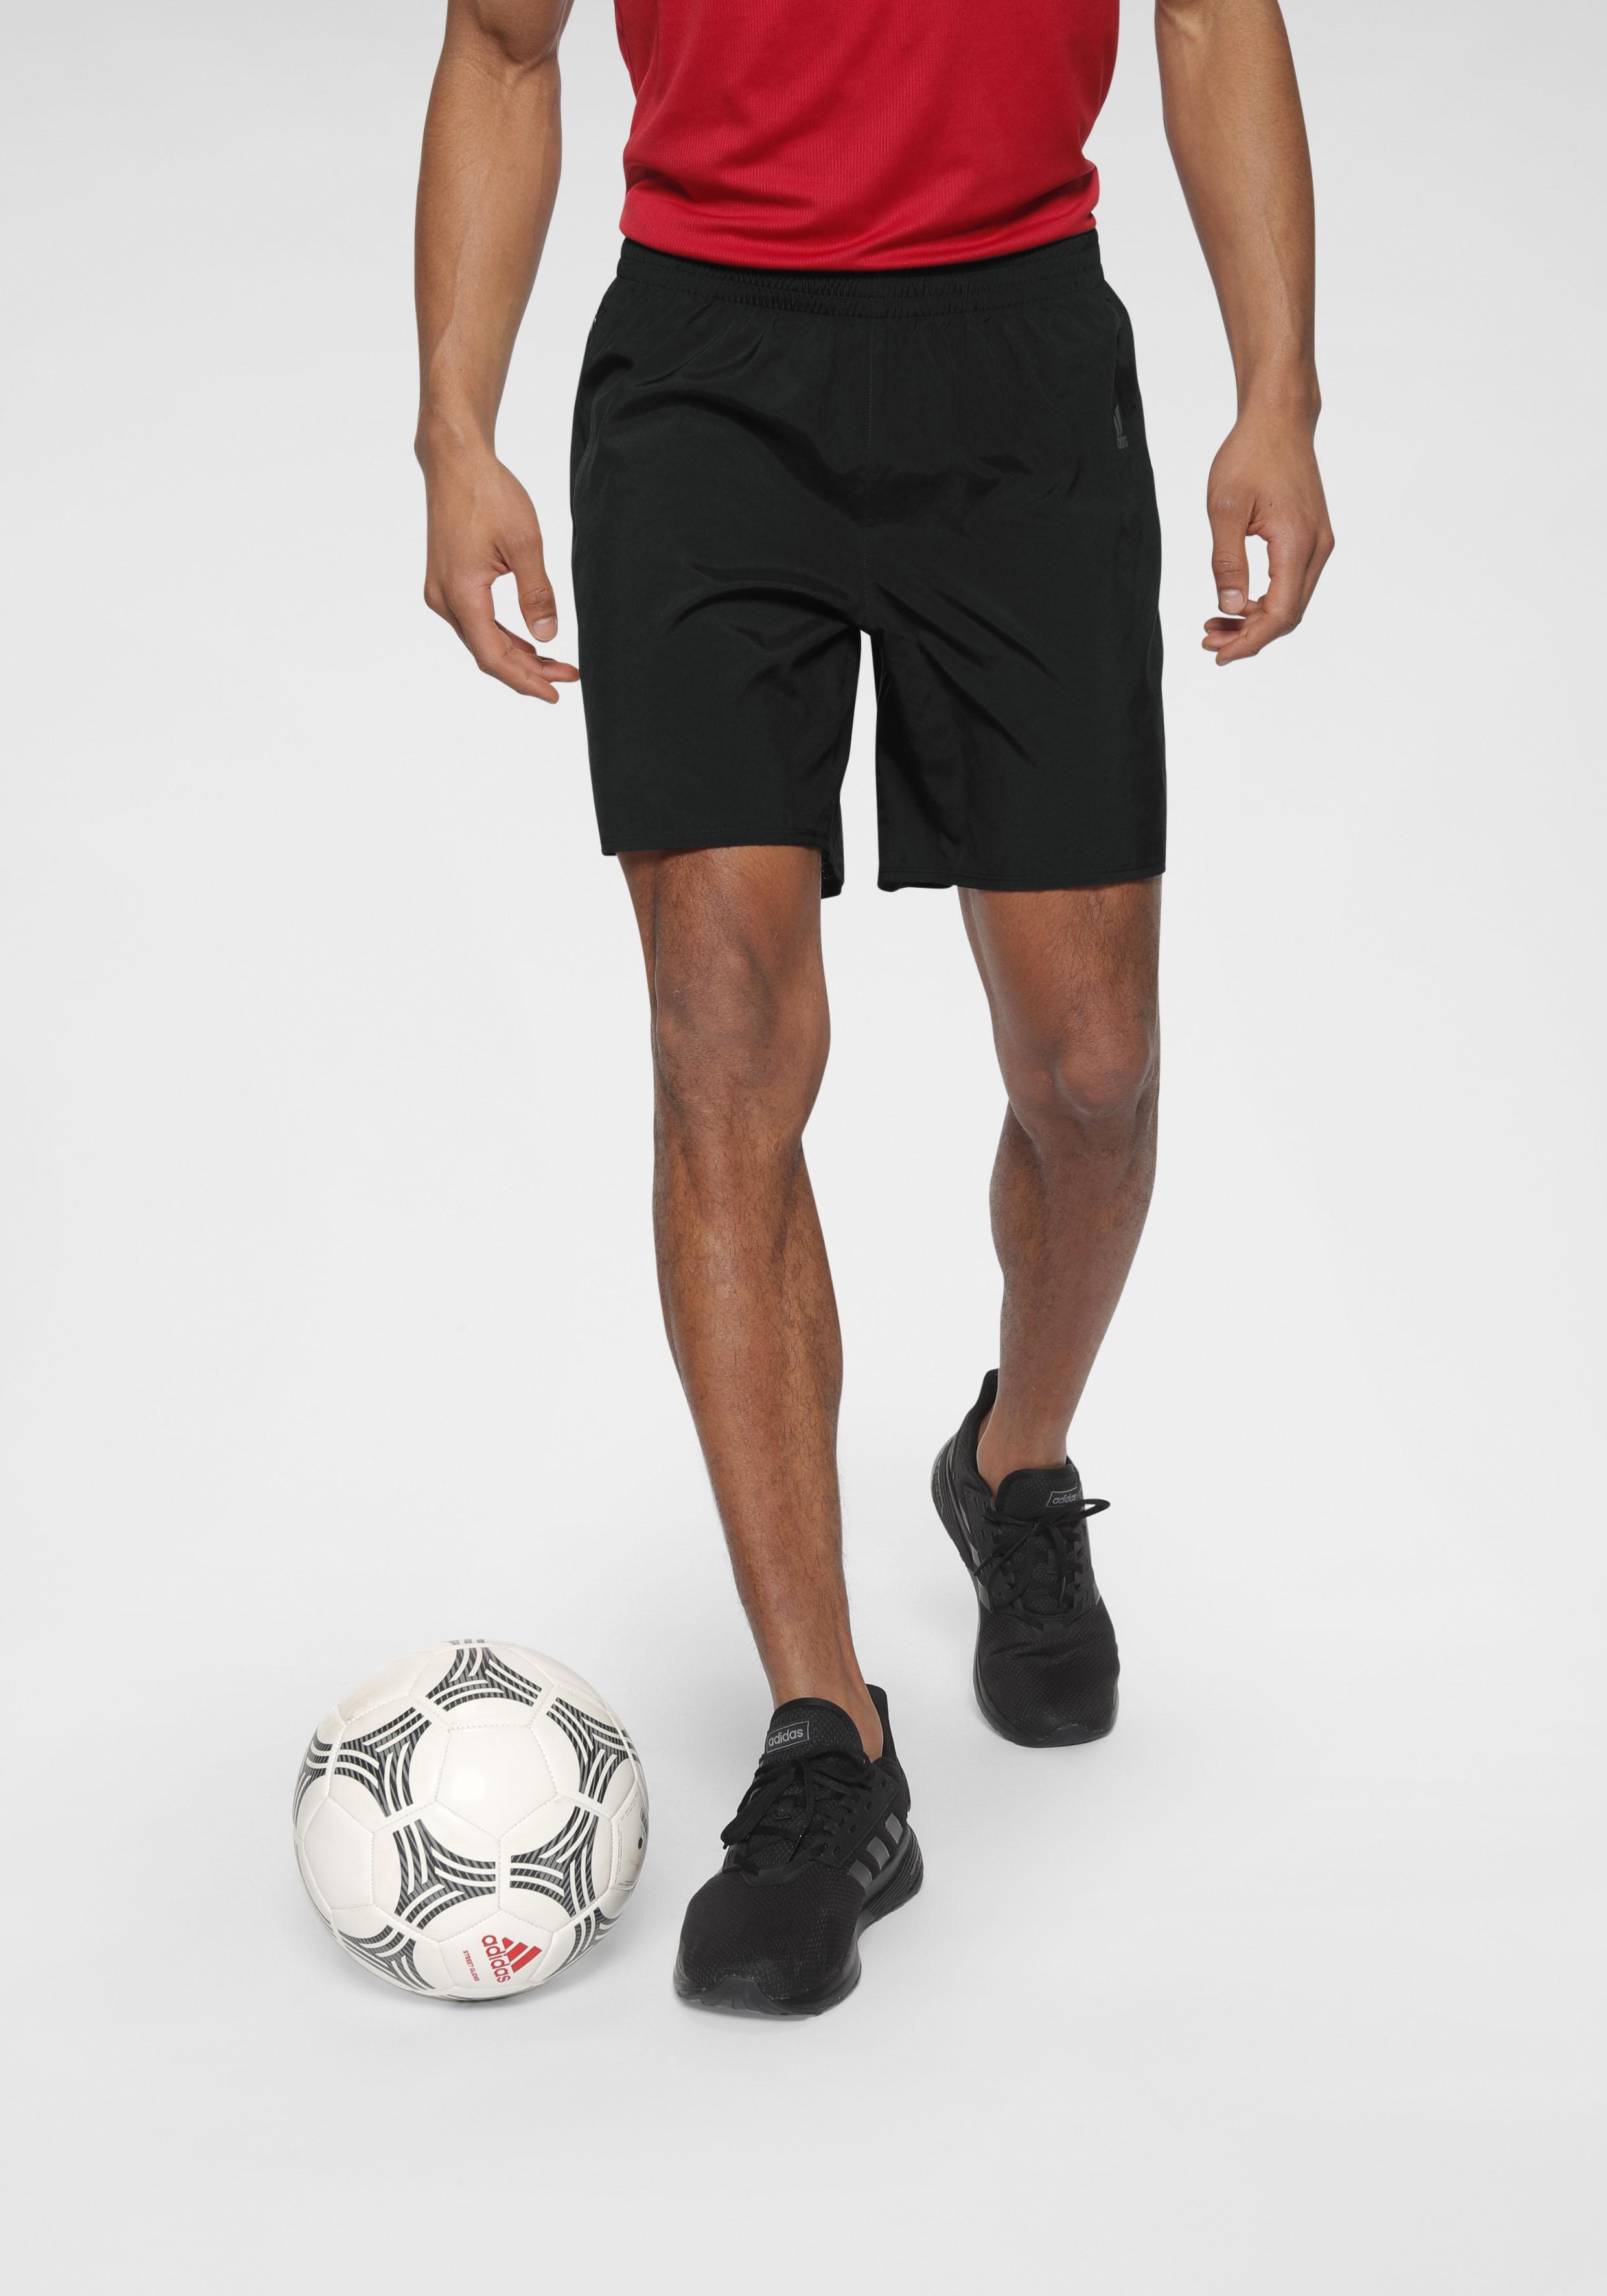 adidas Performance Laufshorts schwarz Herren Laufhosen Sporthosen Hosen